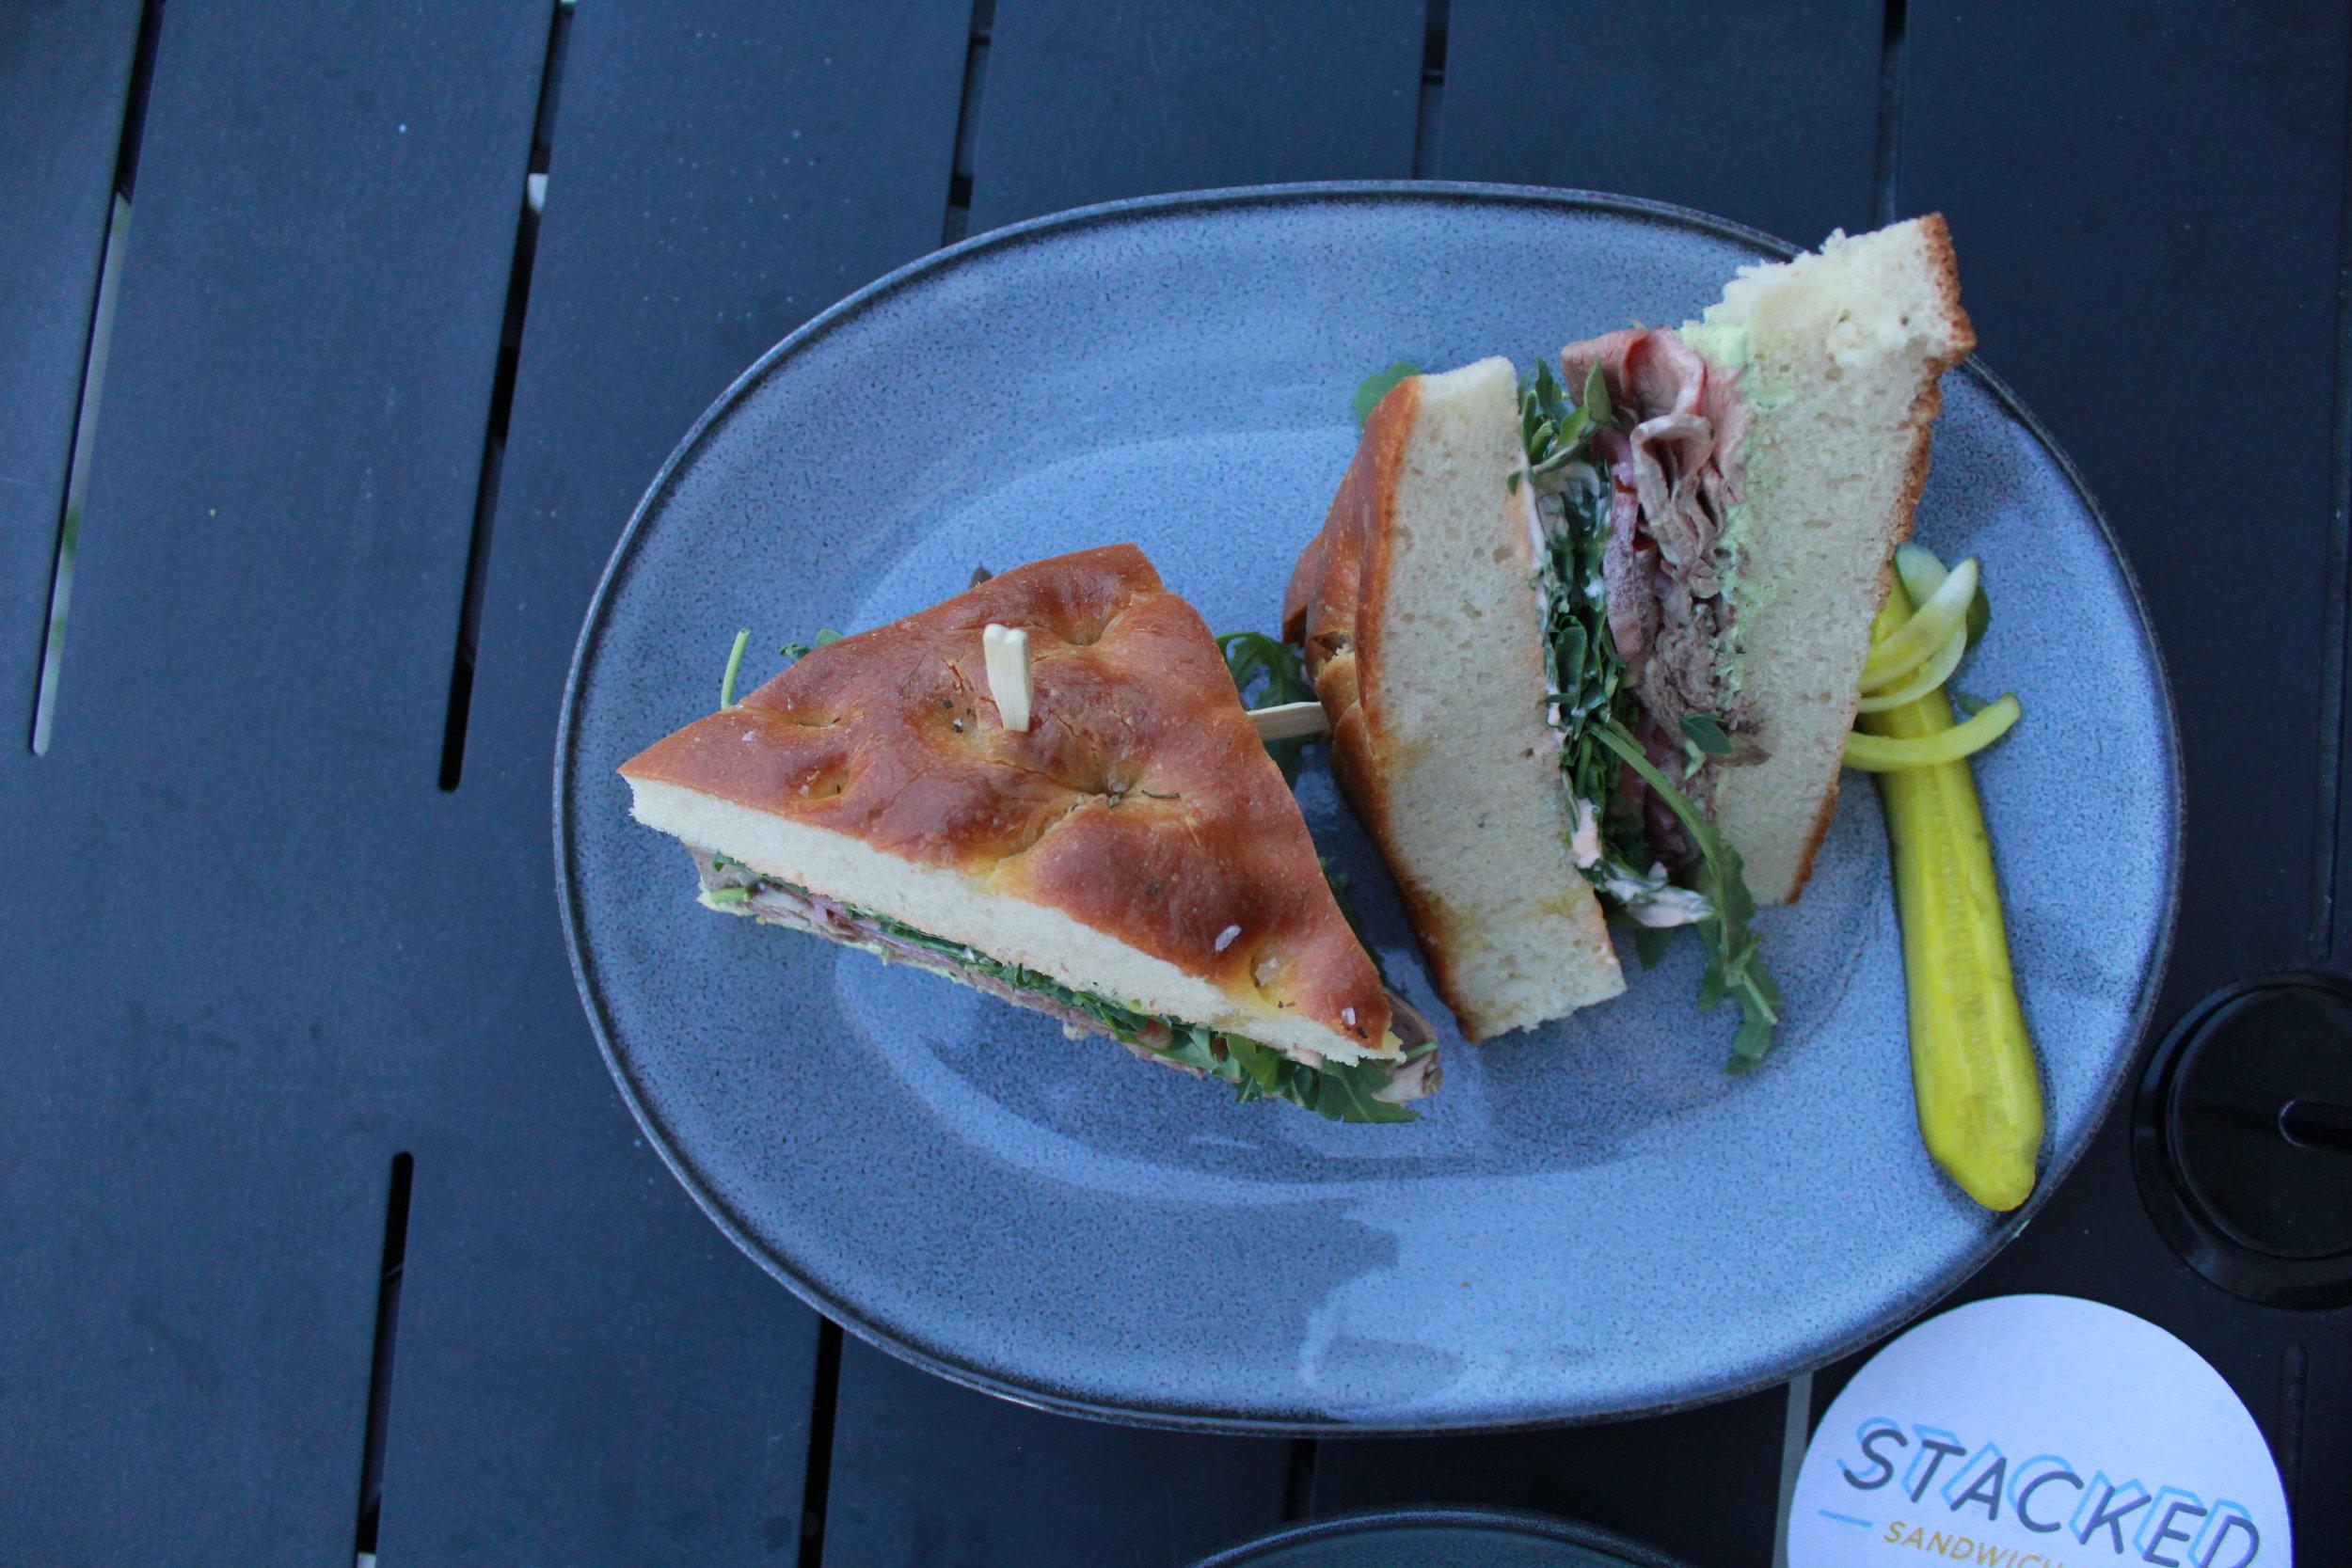 STACKED SANDWICH SHOP PORTLAND